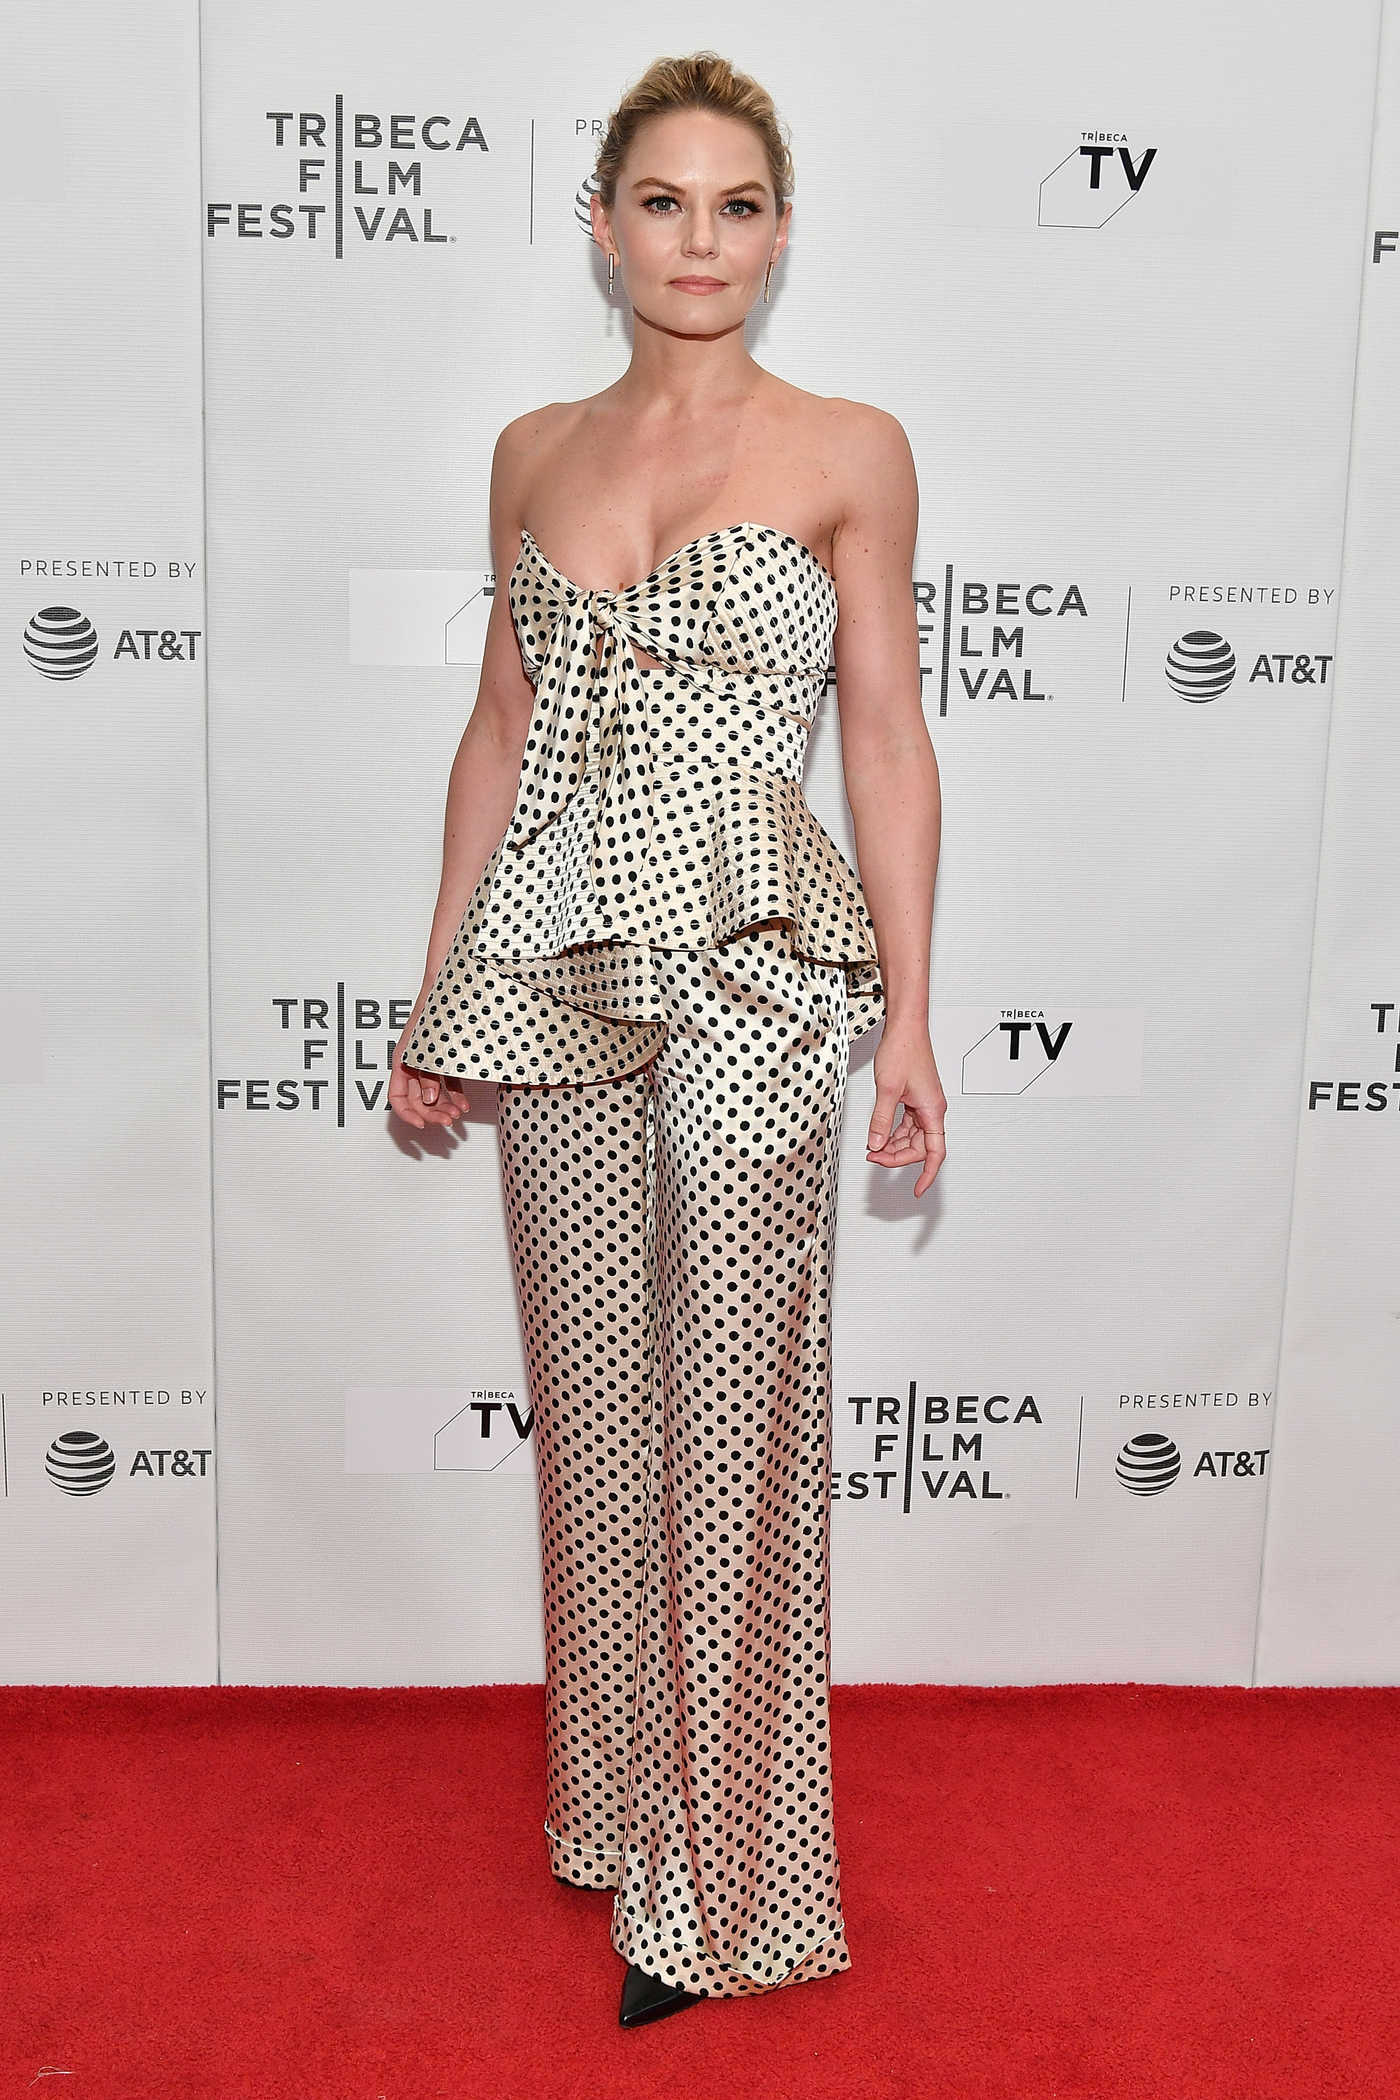 Jennifer Morrison Attends the Chanel Tribeca Film Festival Artists Dinner at Balthazar in New York 04/23/2018